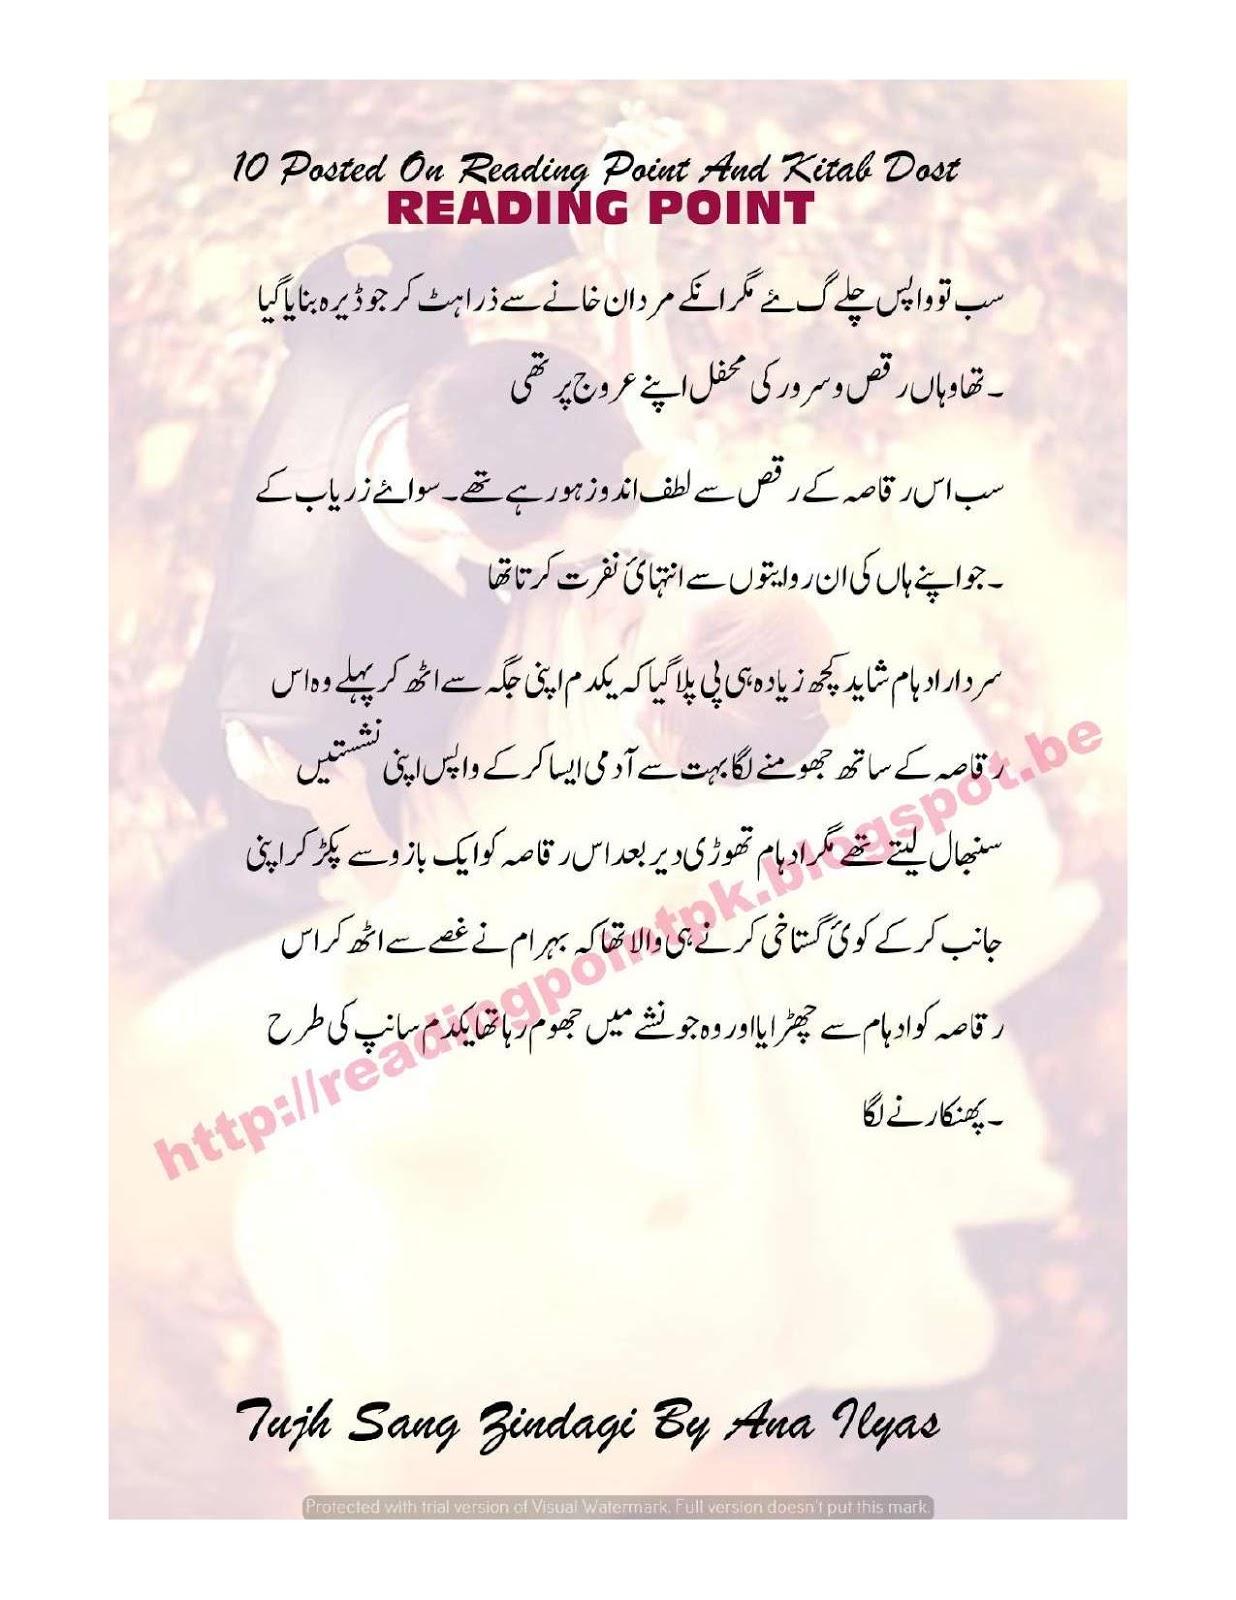 Rooh ka rishta novel by ana ilyas pdf download | Rooh KA